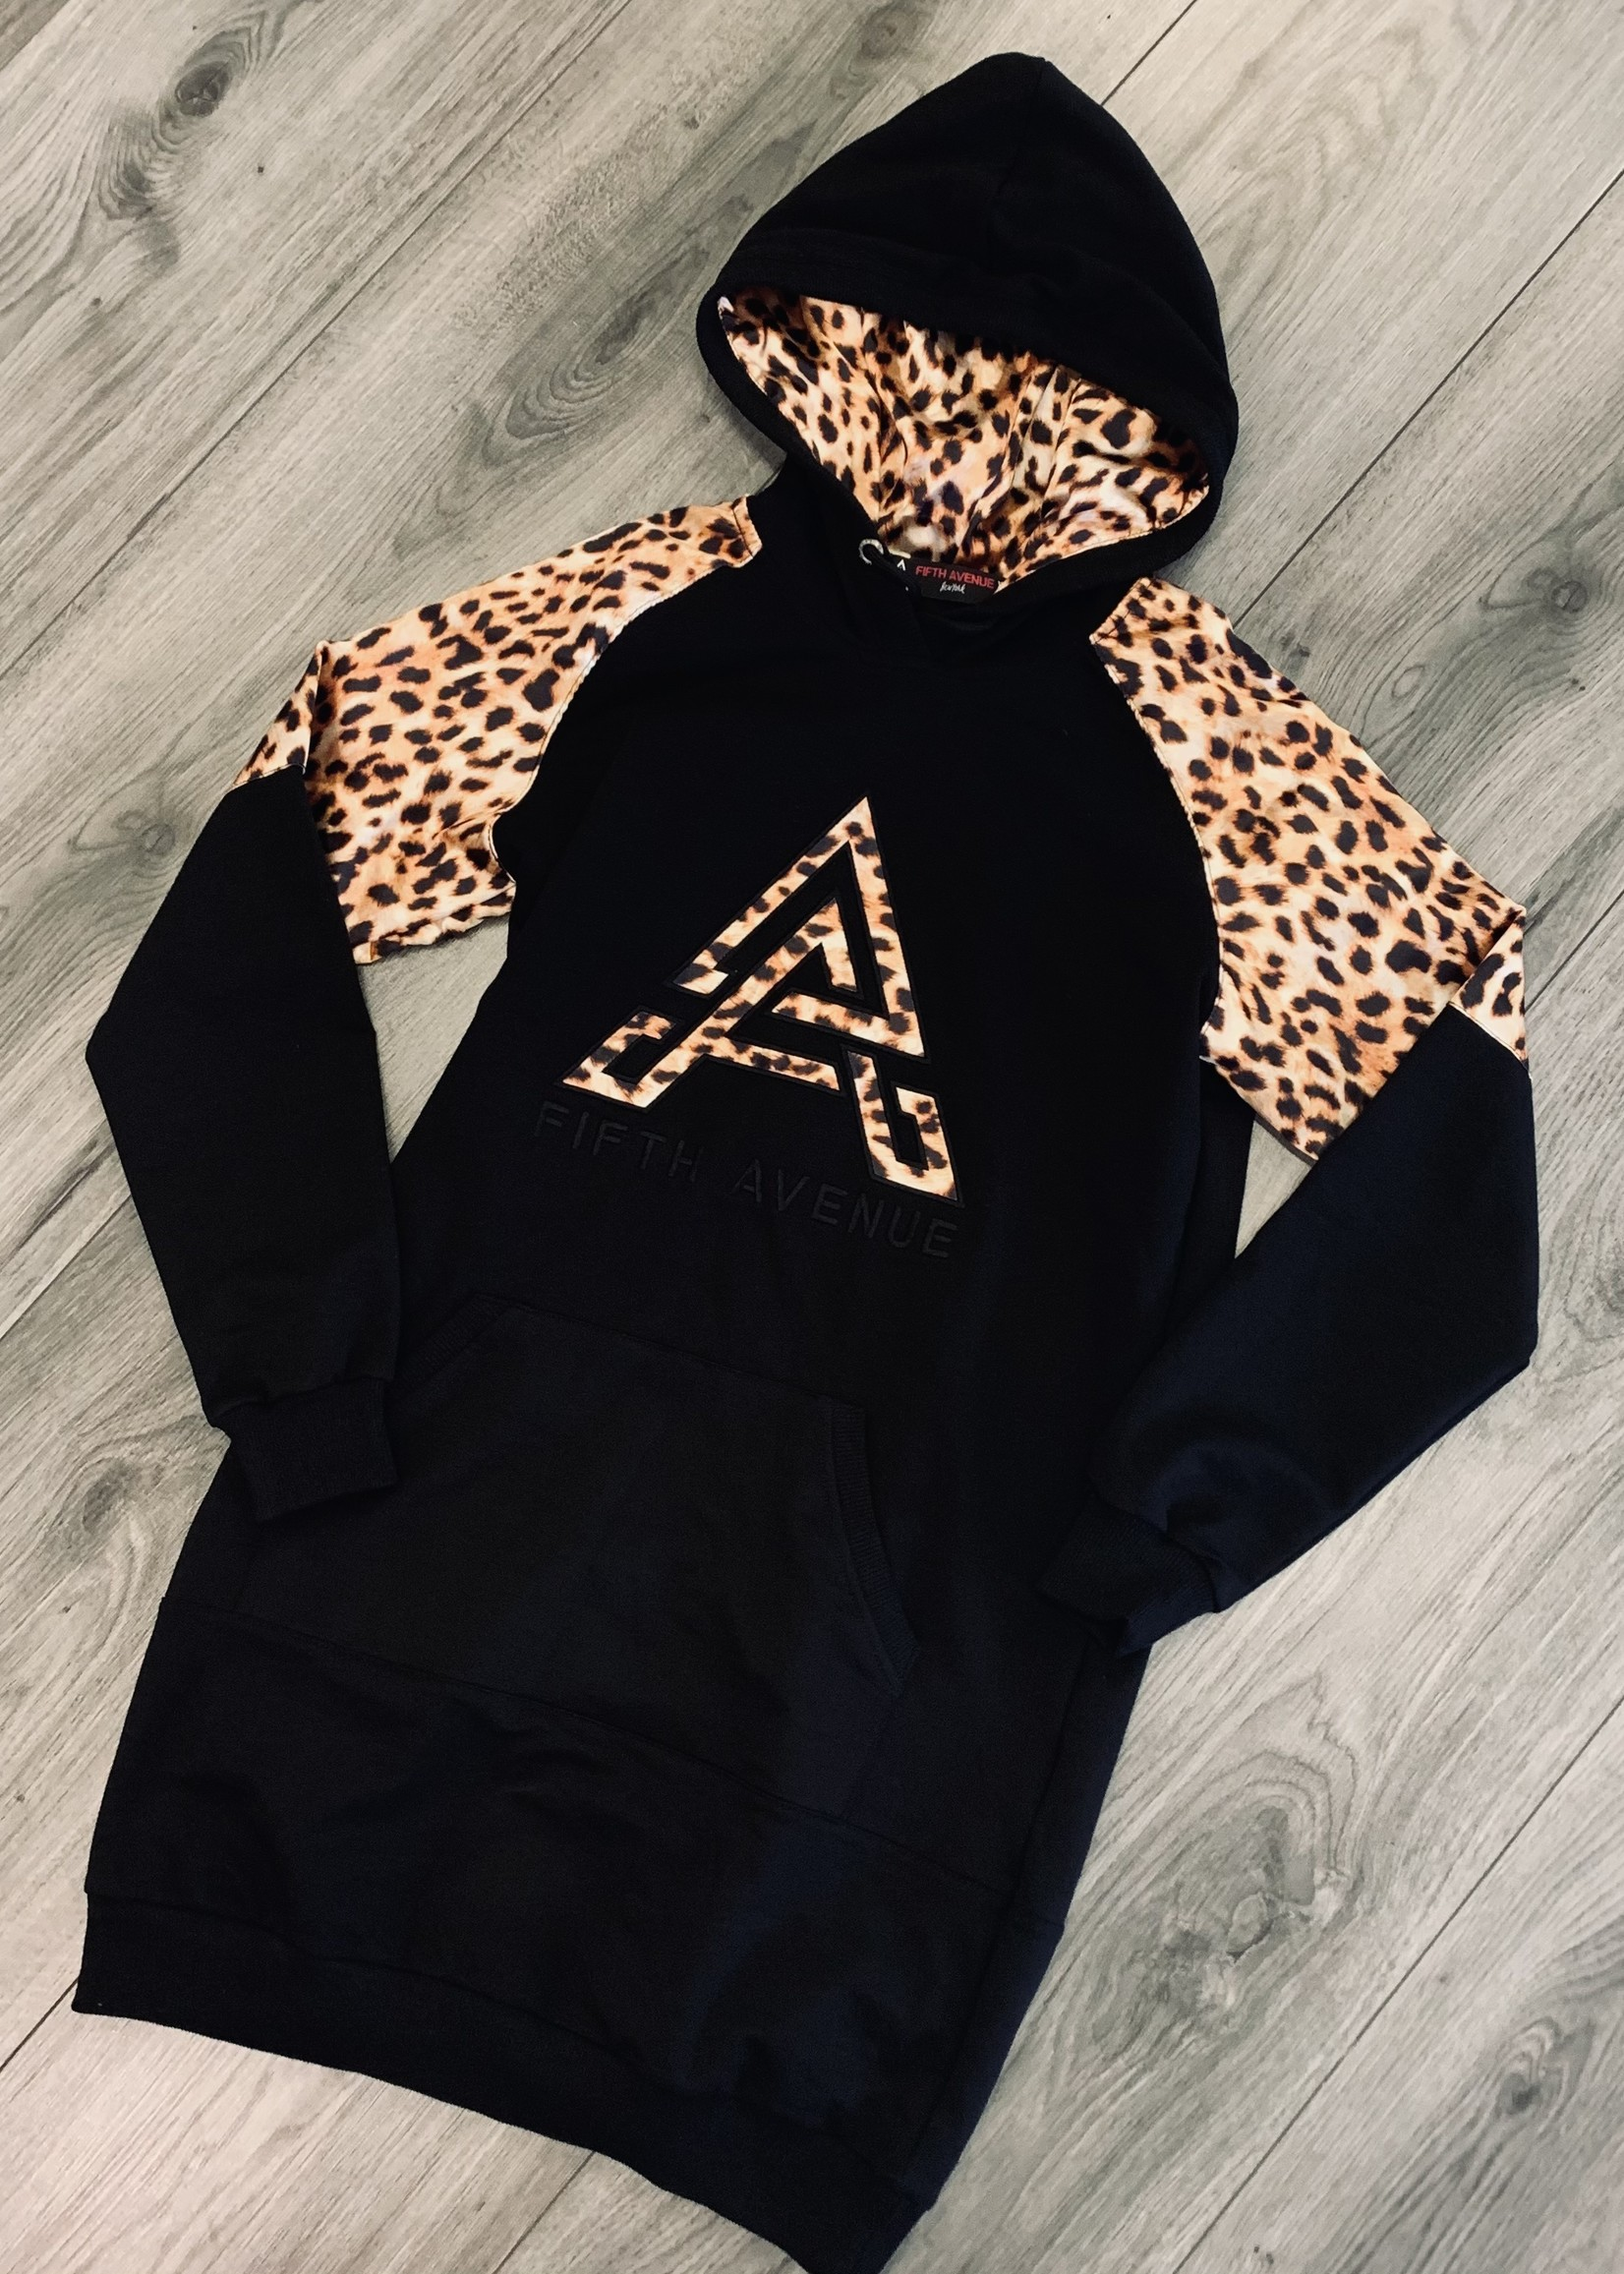 Fifth Avenue Fifth Avenue leopard dress gold